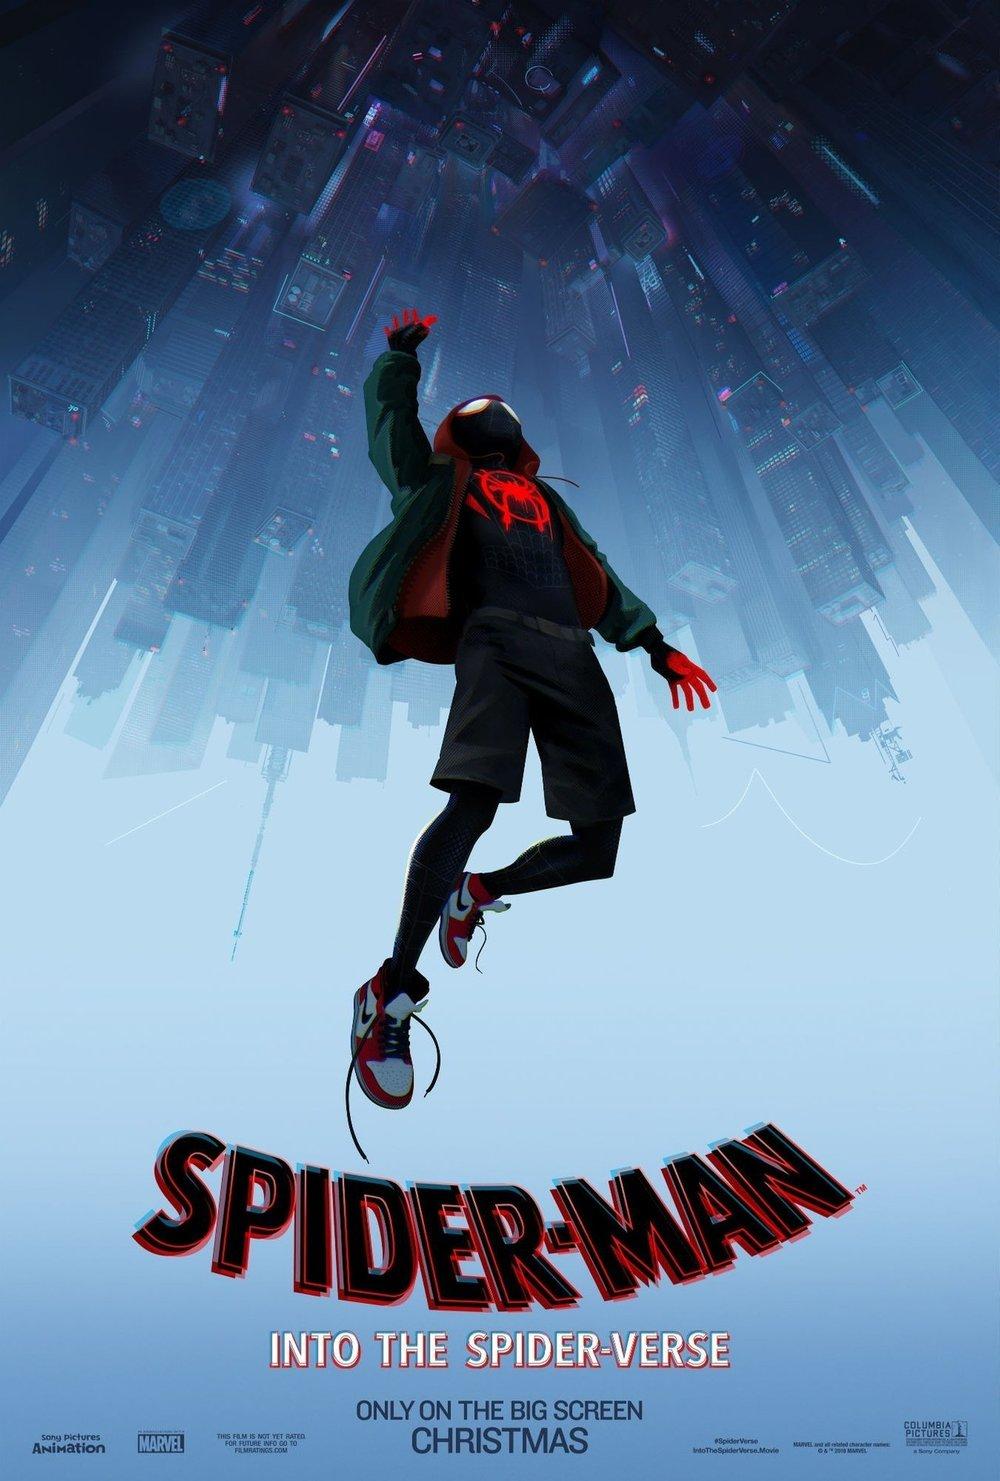 spider-man-into-the-spider-verse-dom-asm-online-1sht-6072x9000-05-aoj-rgb-1532383689774_1280w.jpg